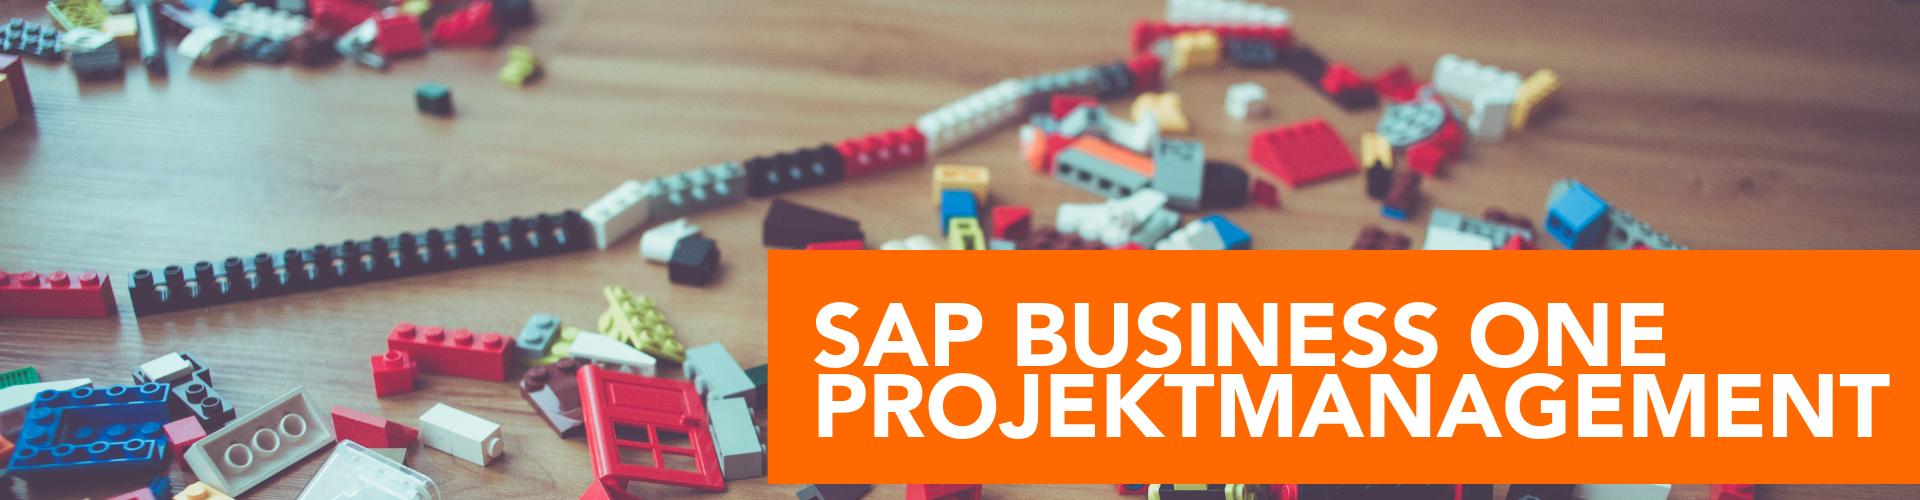 SAP Business One Projektmanagement